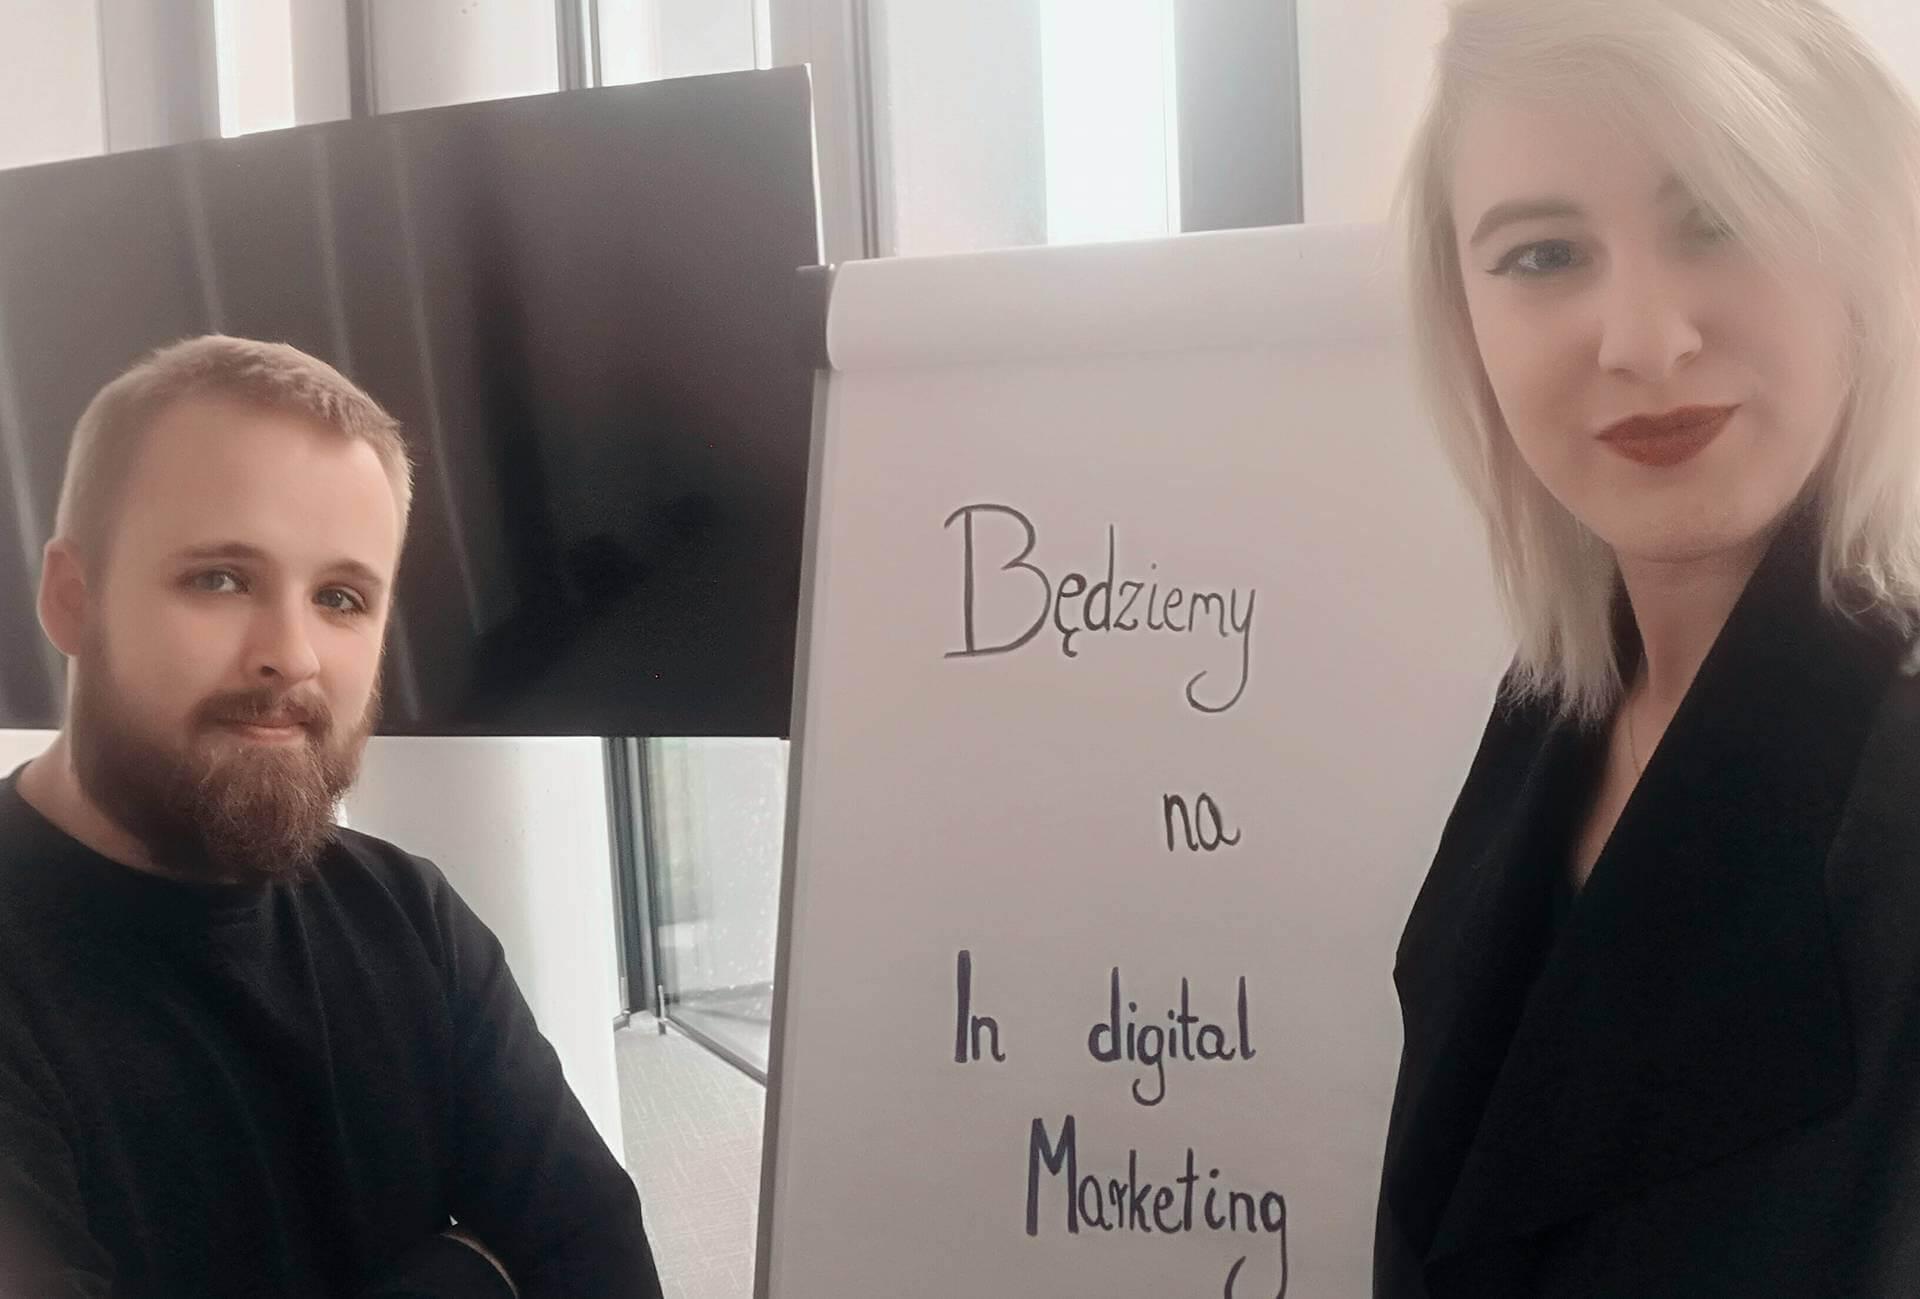 In Digital Marketing